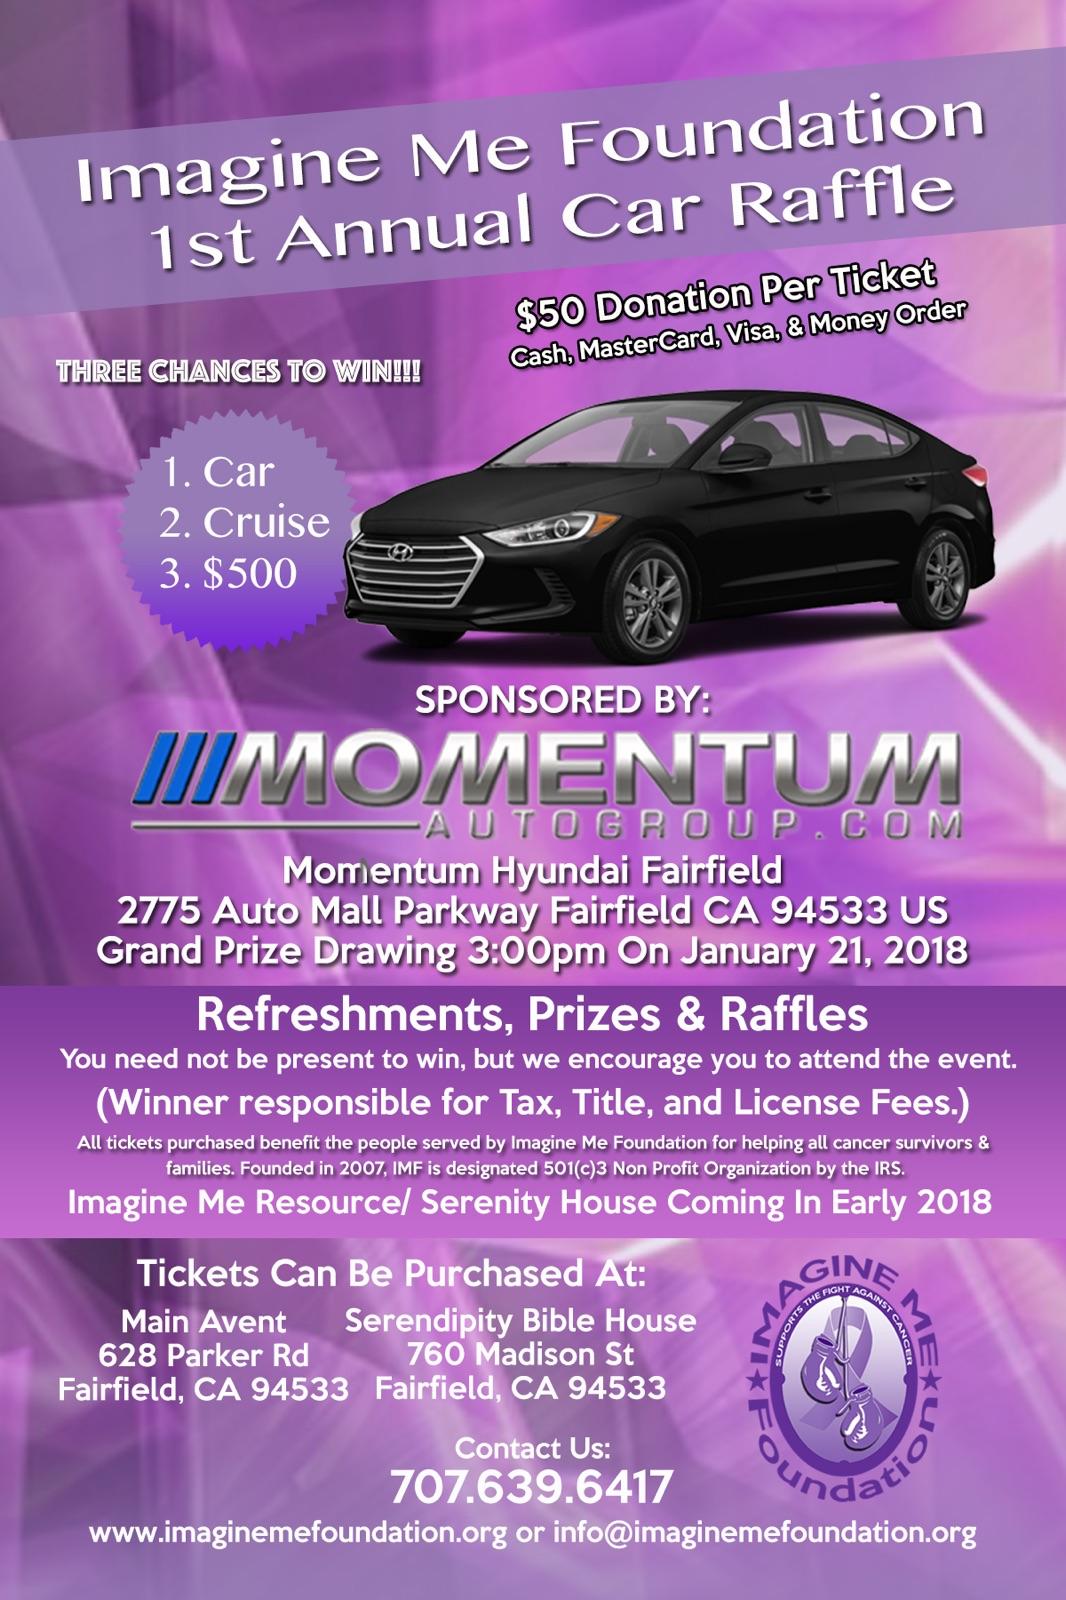 Imagine Me Foundation 1st Annual Car Raffle